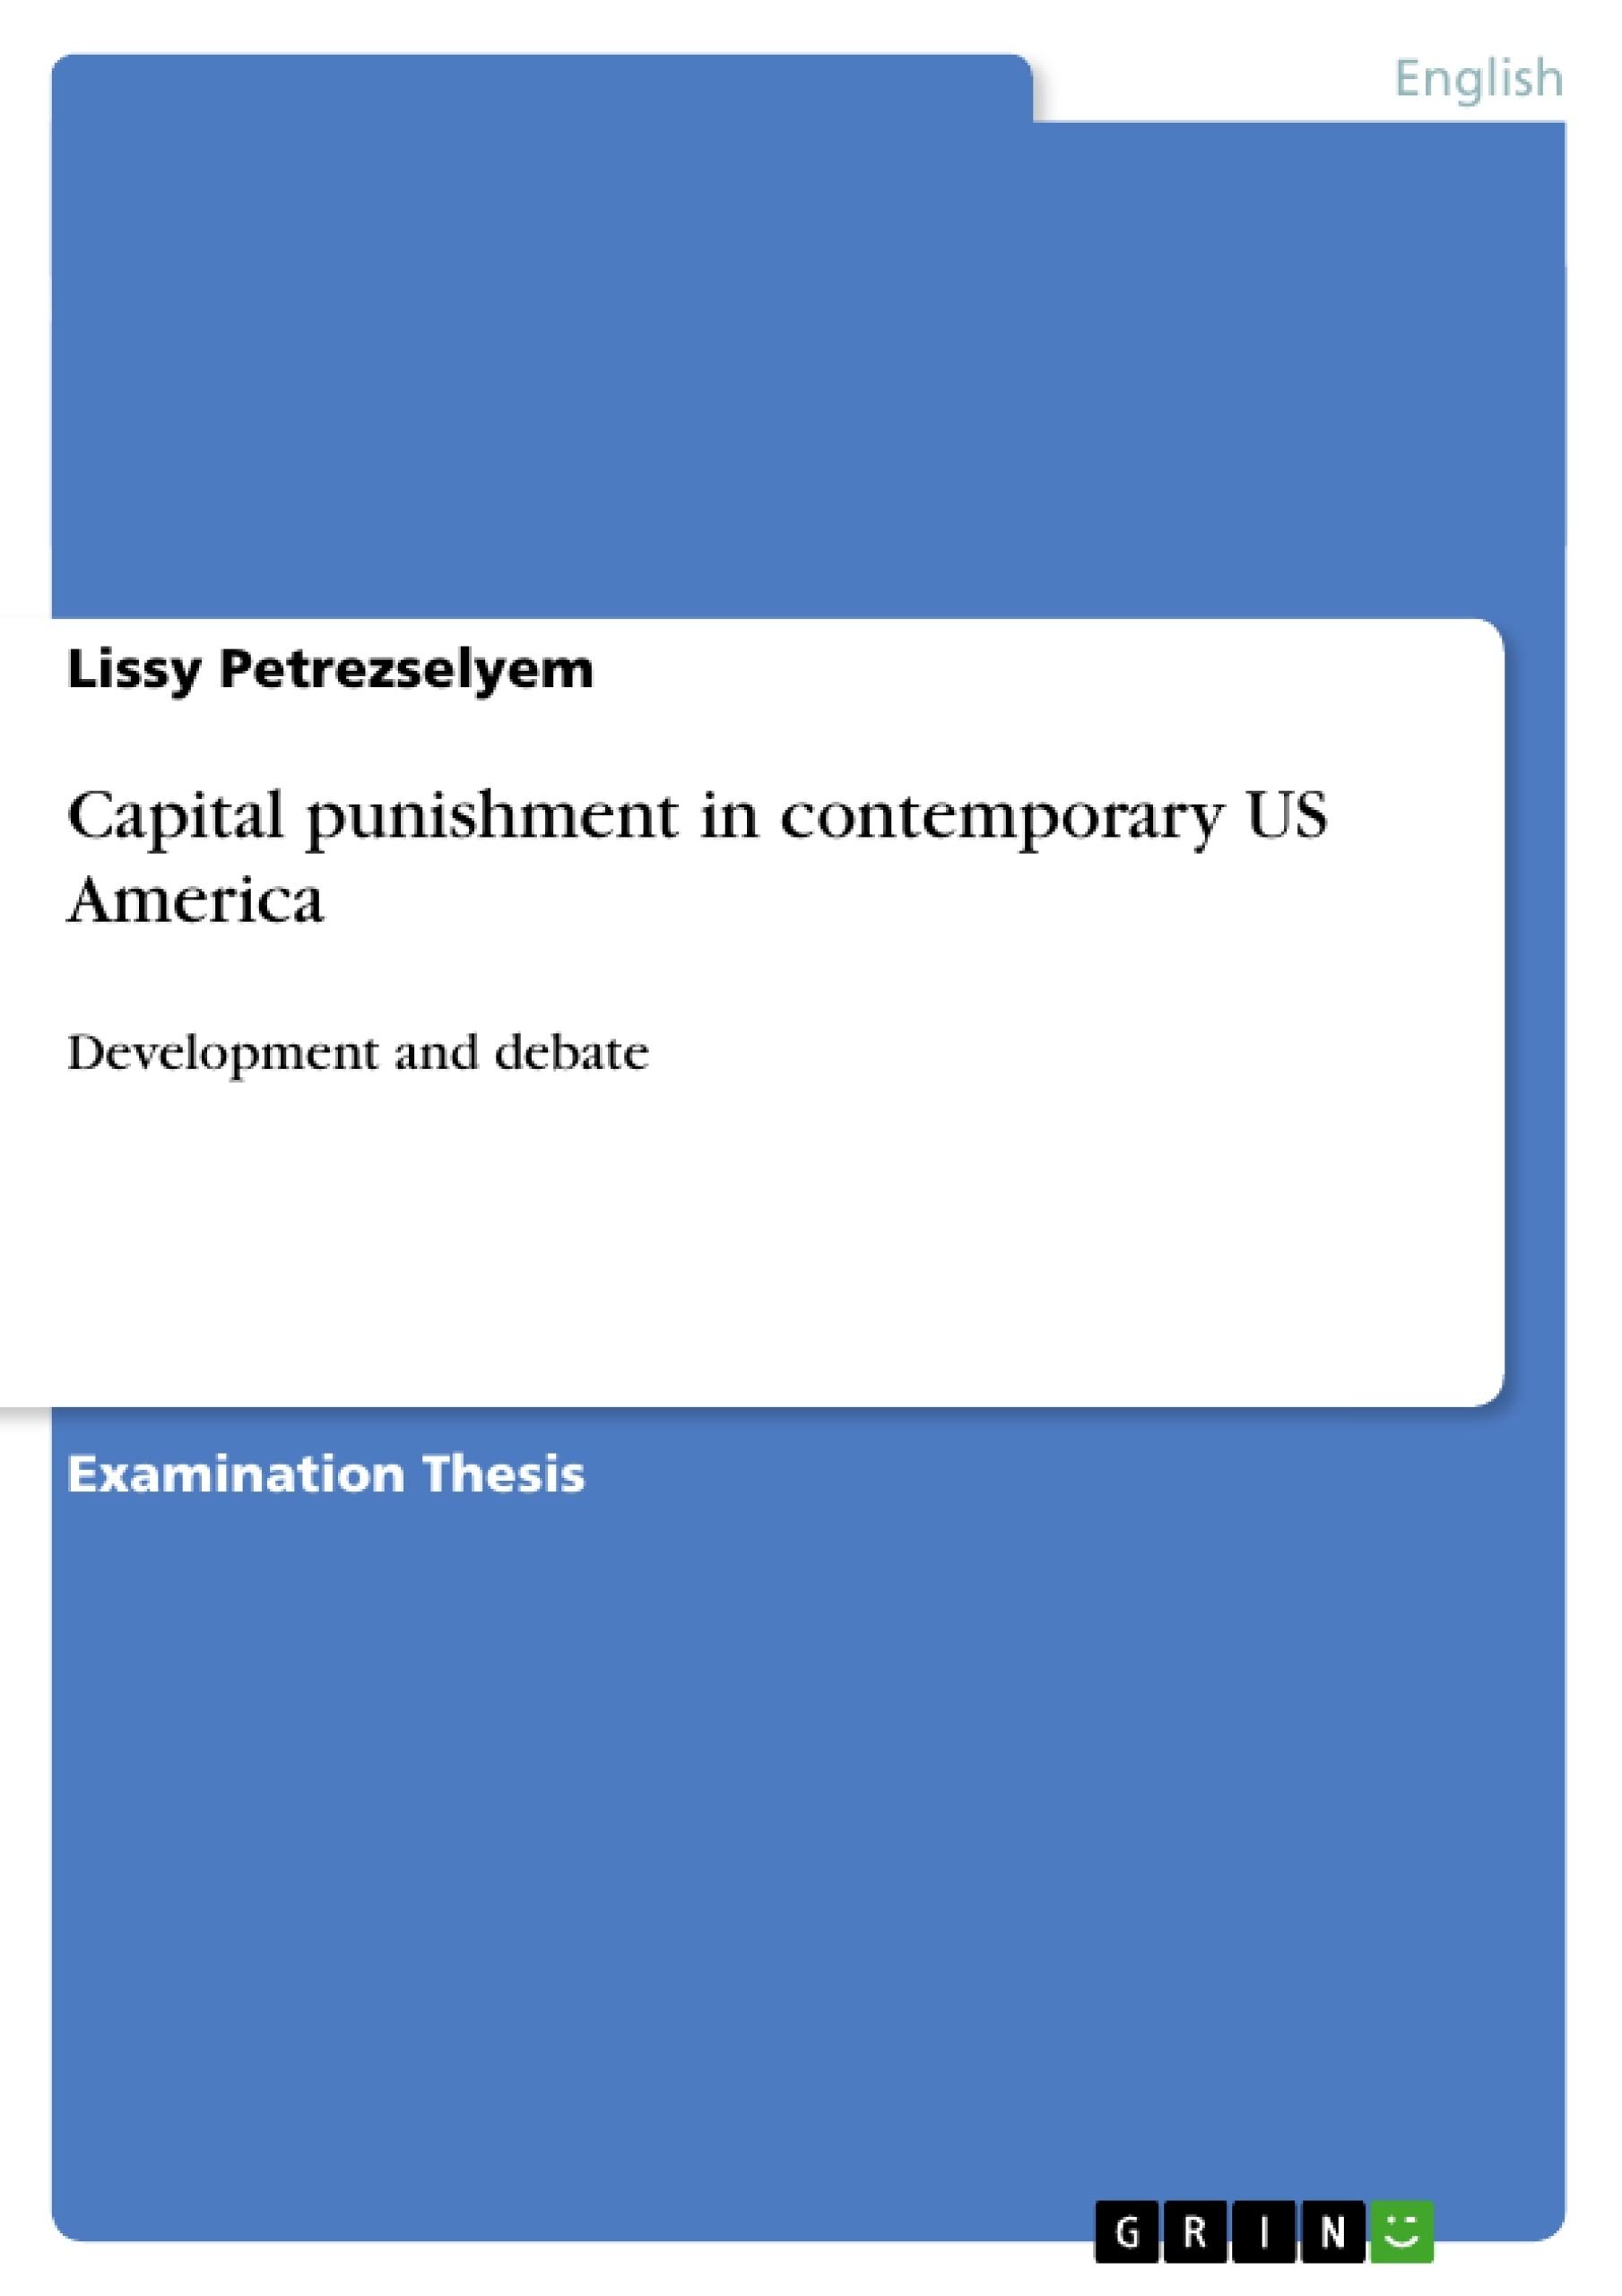 Title: Capital punishment in contemporary US America